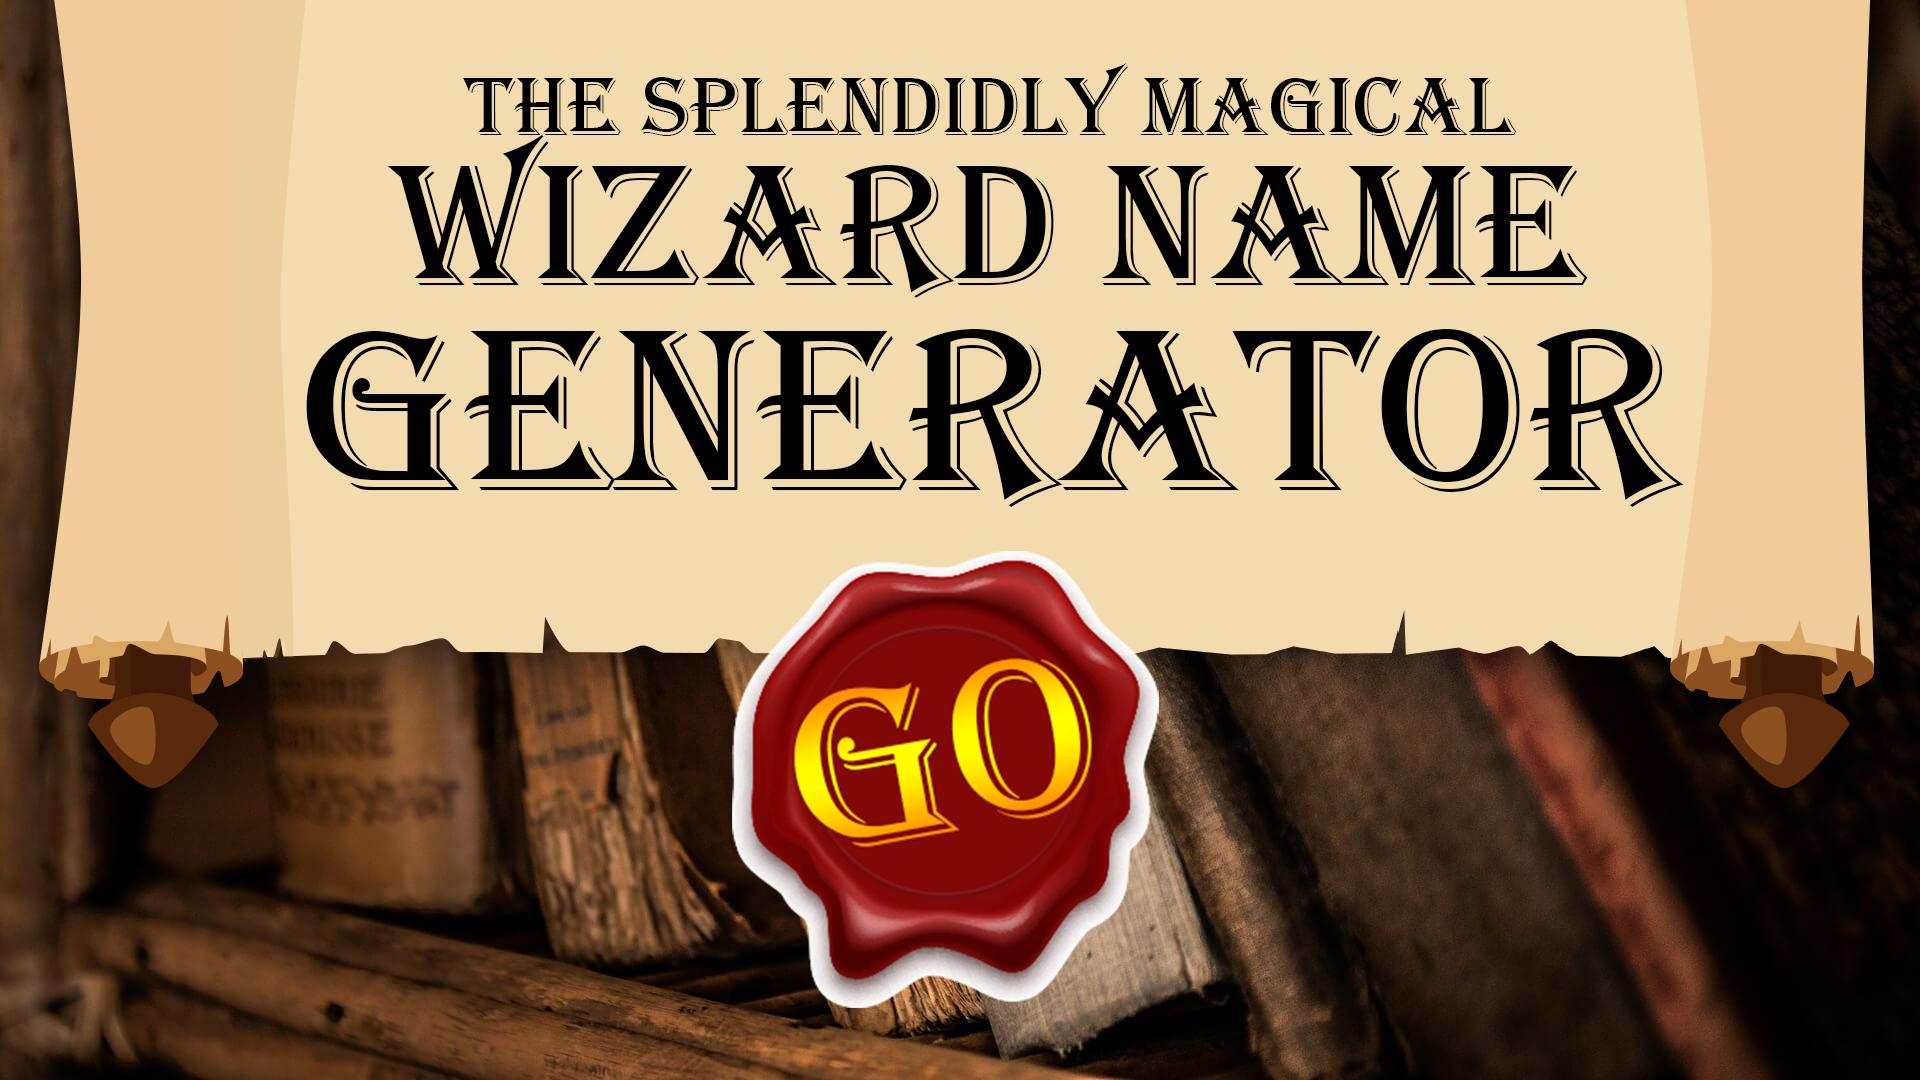 The Wizard Name Generator